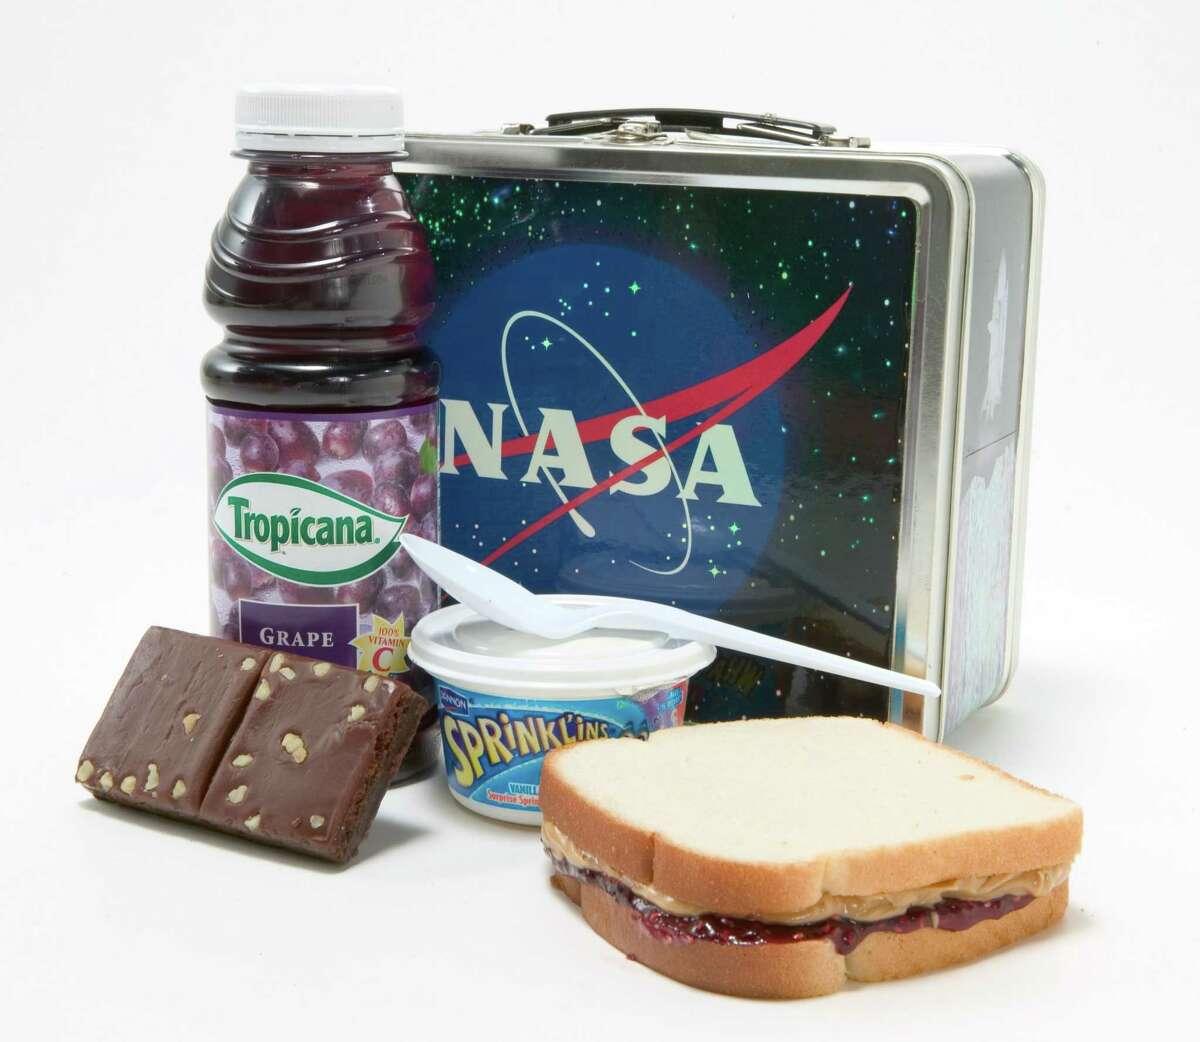 2005: NASA lunchbox with sandwich, yogurt, brownie, and grape juice. (Photo by John B. Carnett/Bonnier Corporation via Getty Images)